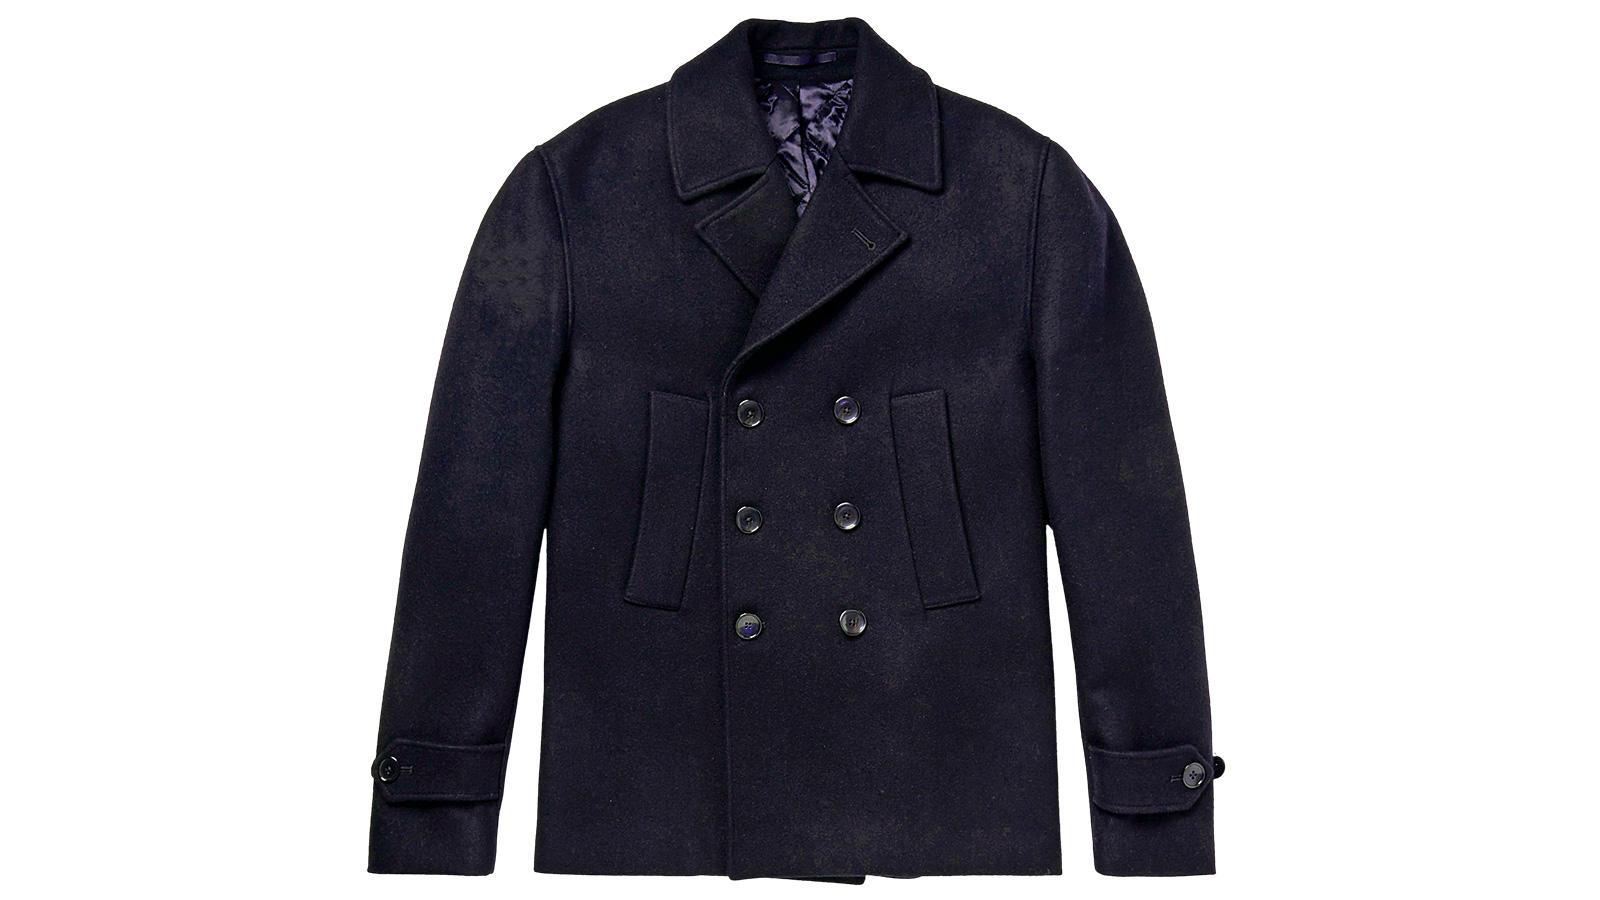 671xAOyJRa6YBnQuZn4a Officine-Generale-Slim-Fit-Double-Breasted-Wool-Peacoat-2560x1440.jpg faf4cf5667